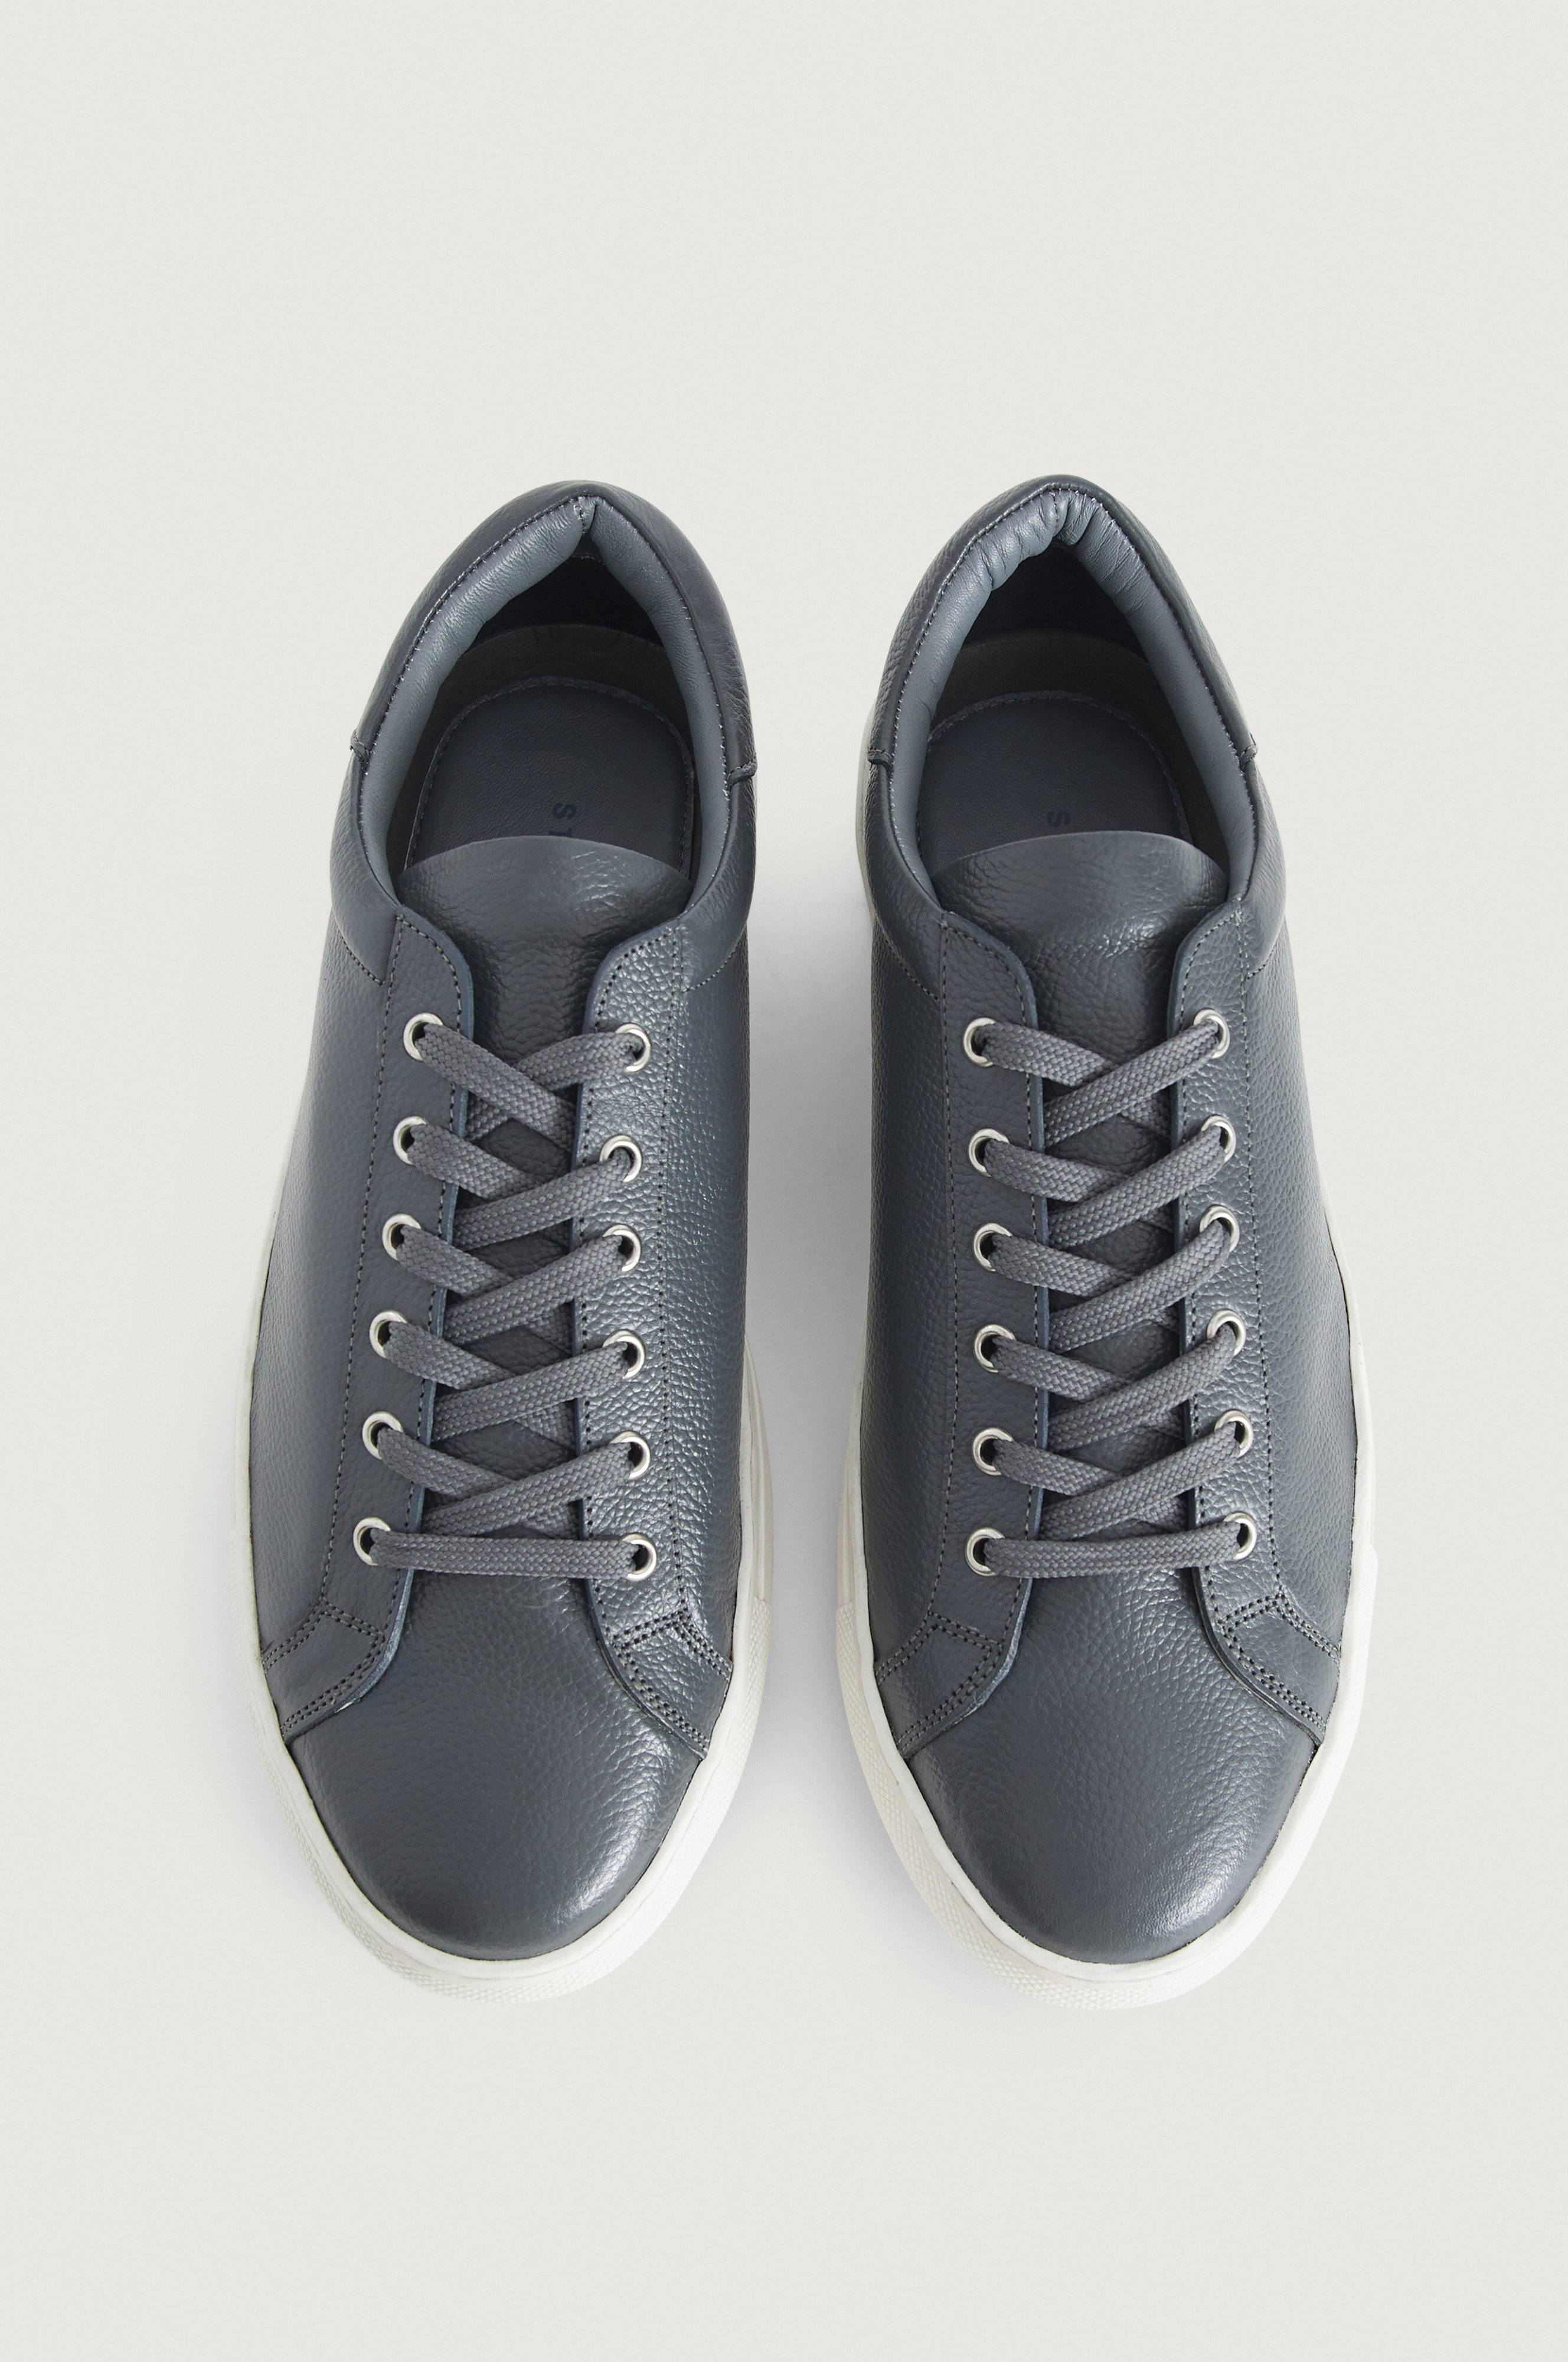 Studio Total Sneakers Norton Classy Grå Sko Stayhard.no